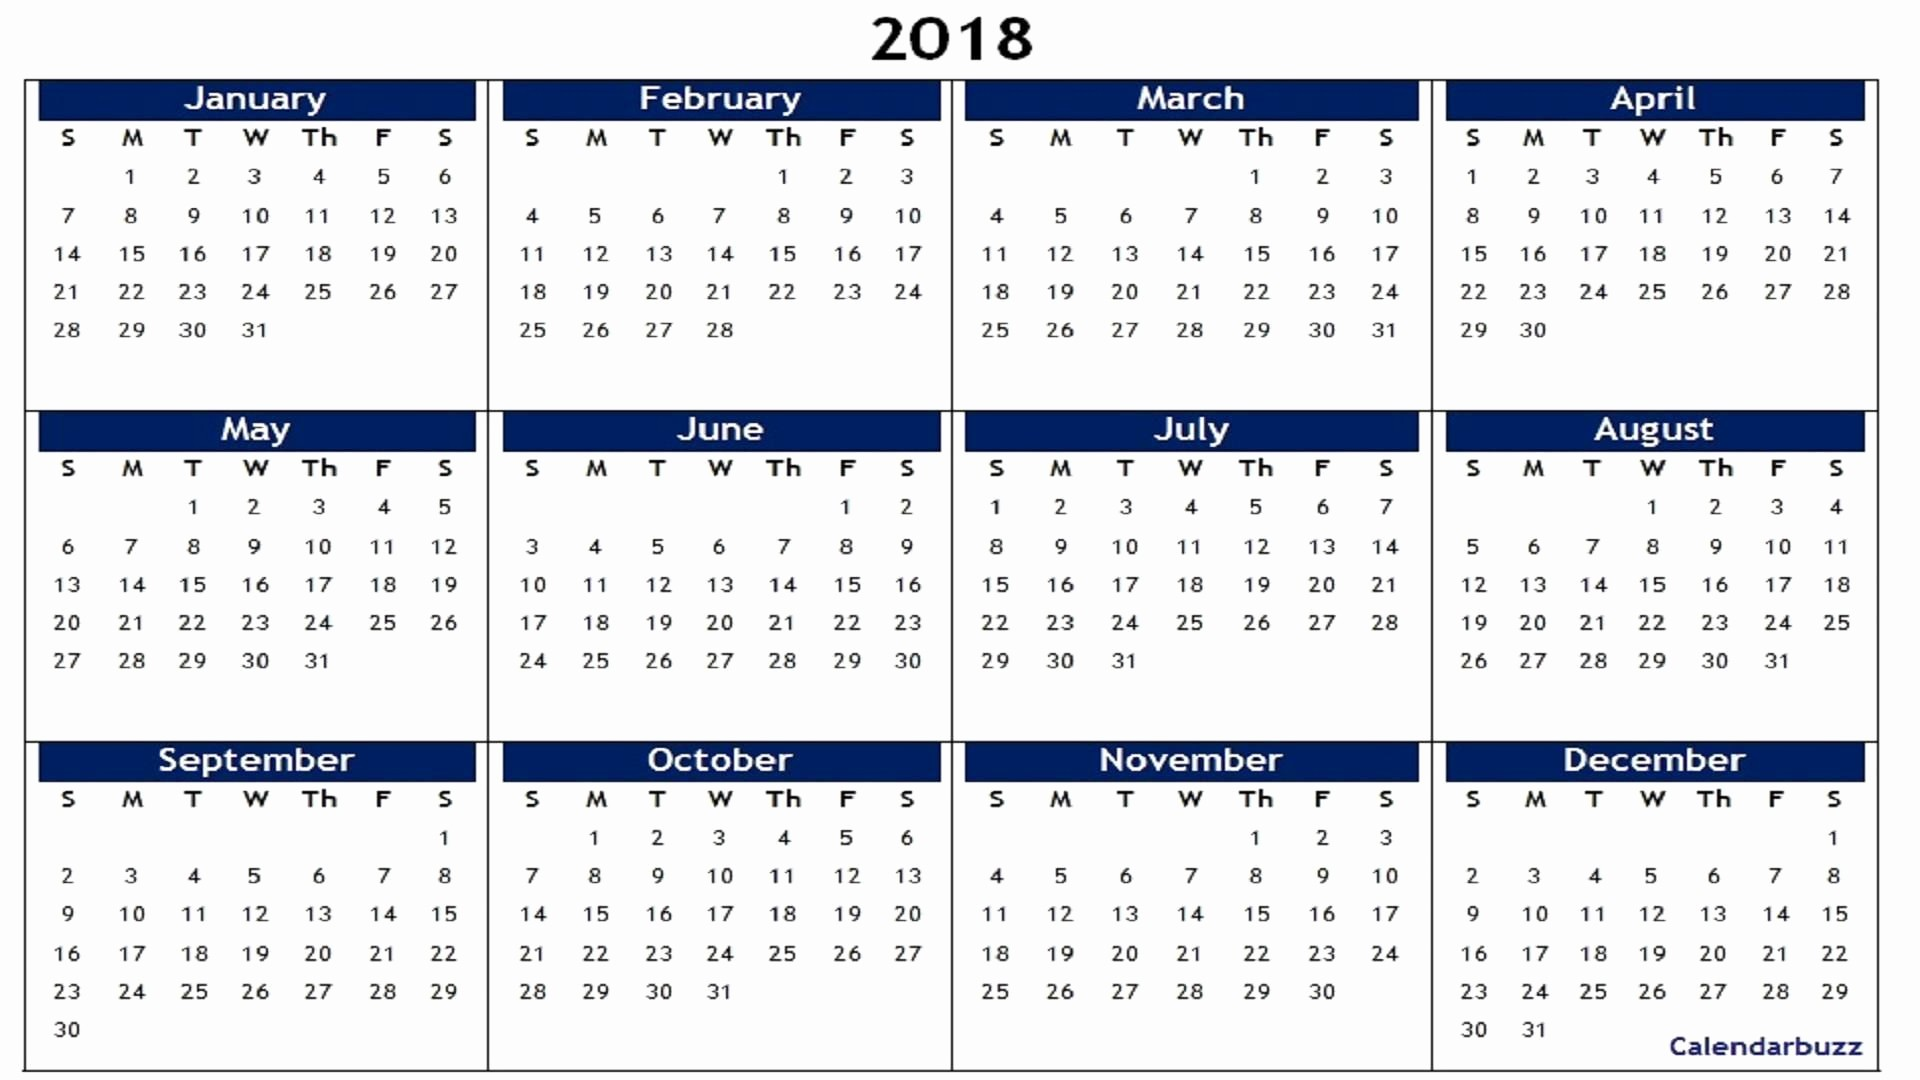 Printable 6 Month Calendar 2018 Inspirational Printable 6 Month Calendar 2018 Gecce Tackletarts